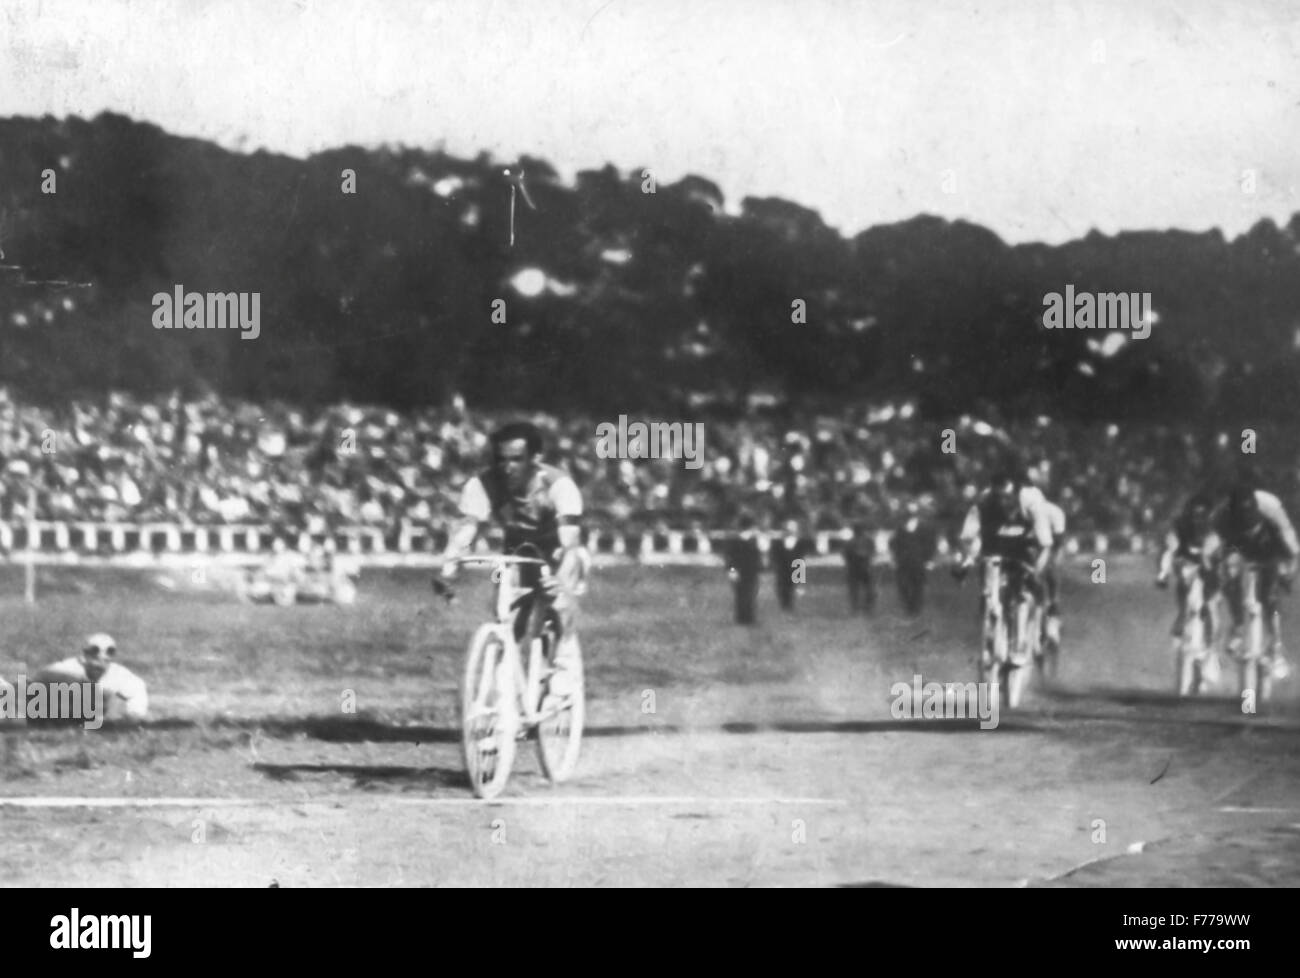 giro d'italia 1919,arena di milano - Stock Image